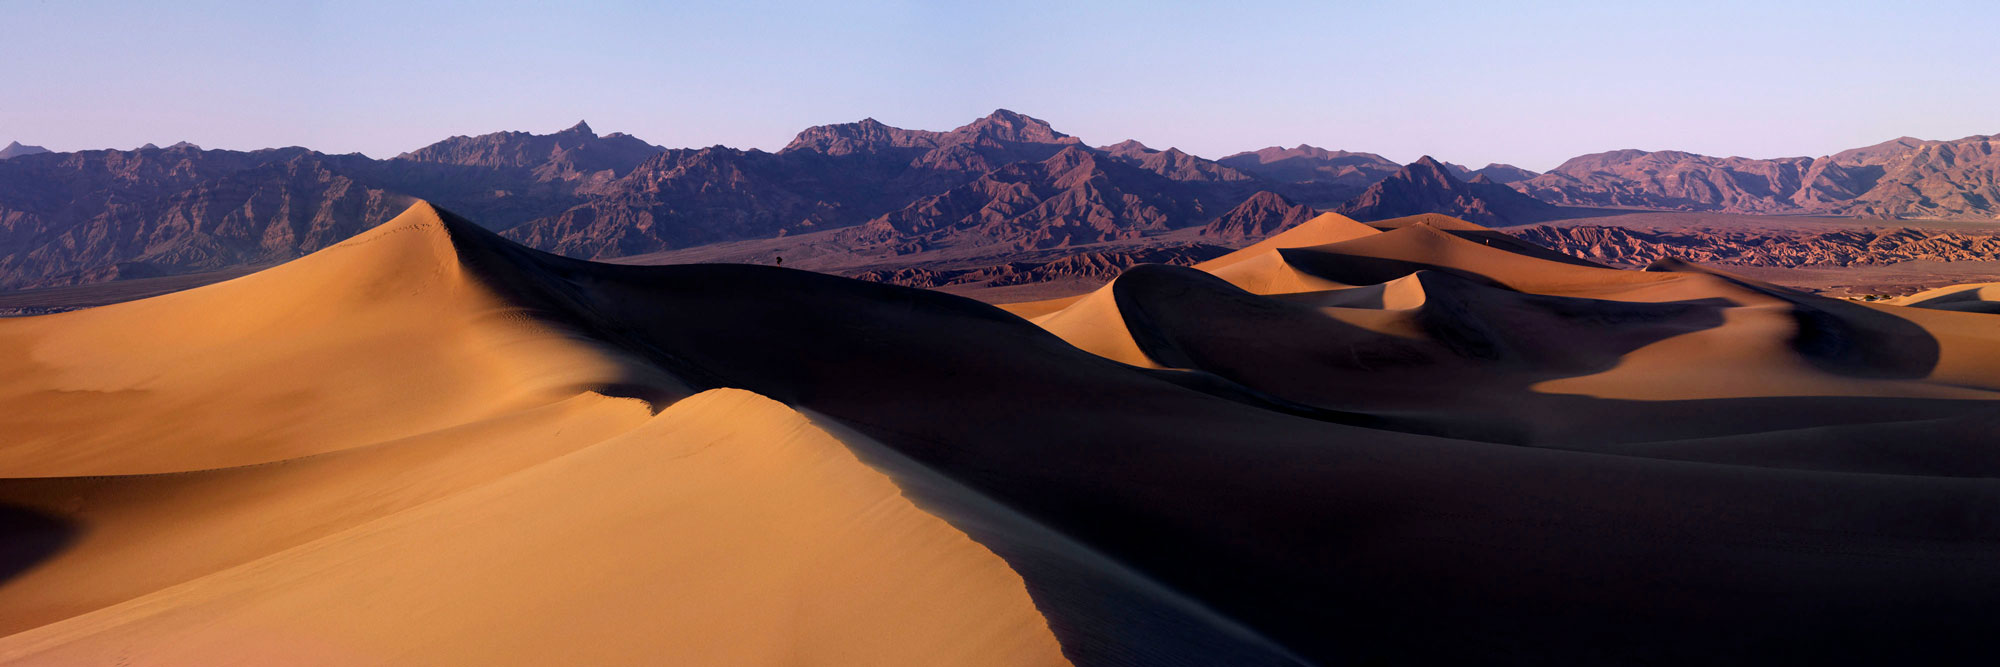 Panoramic print of sand dunes